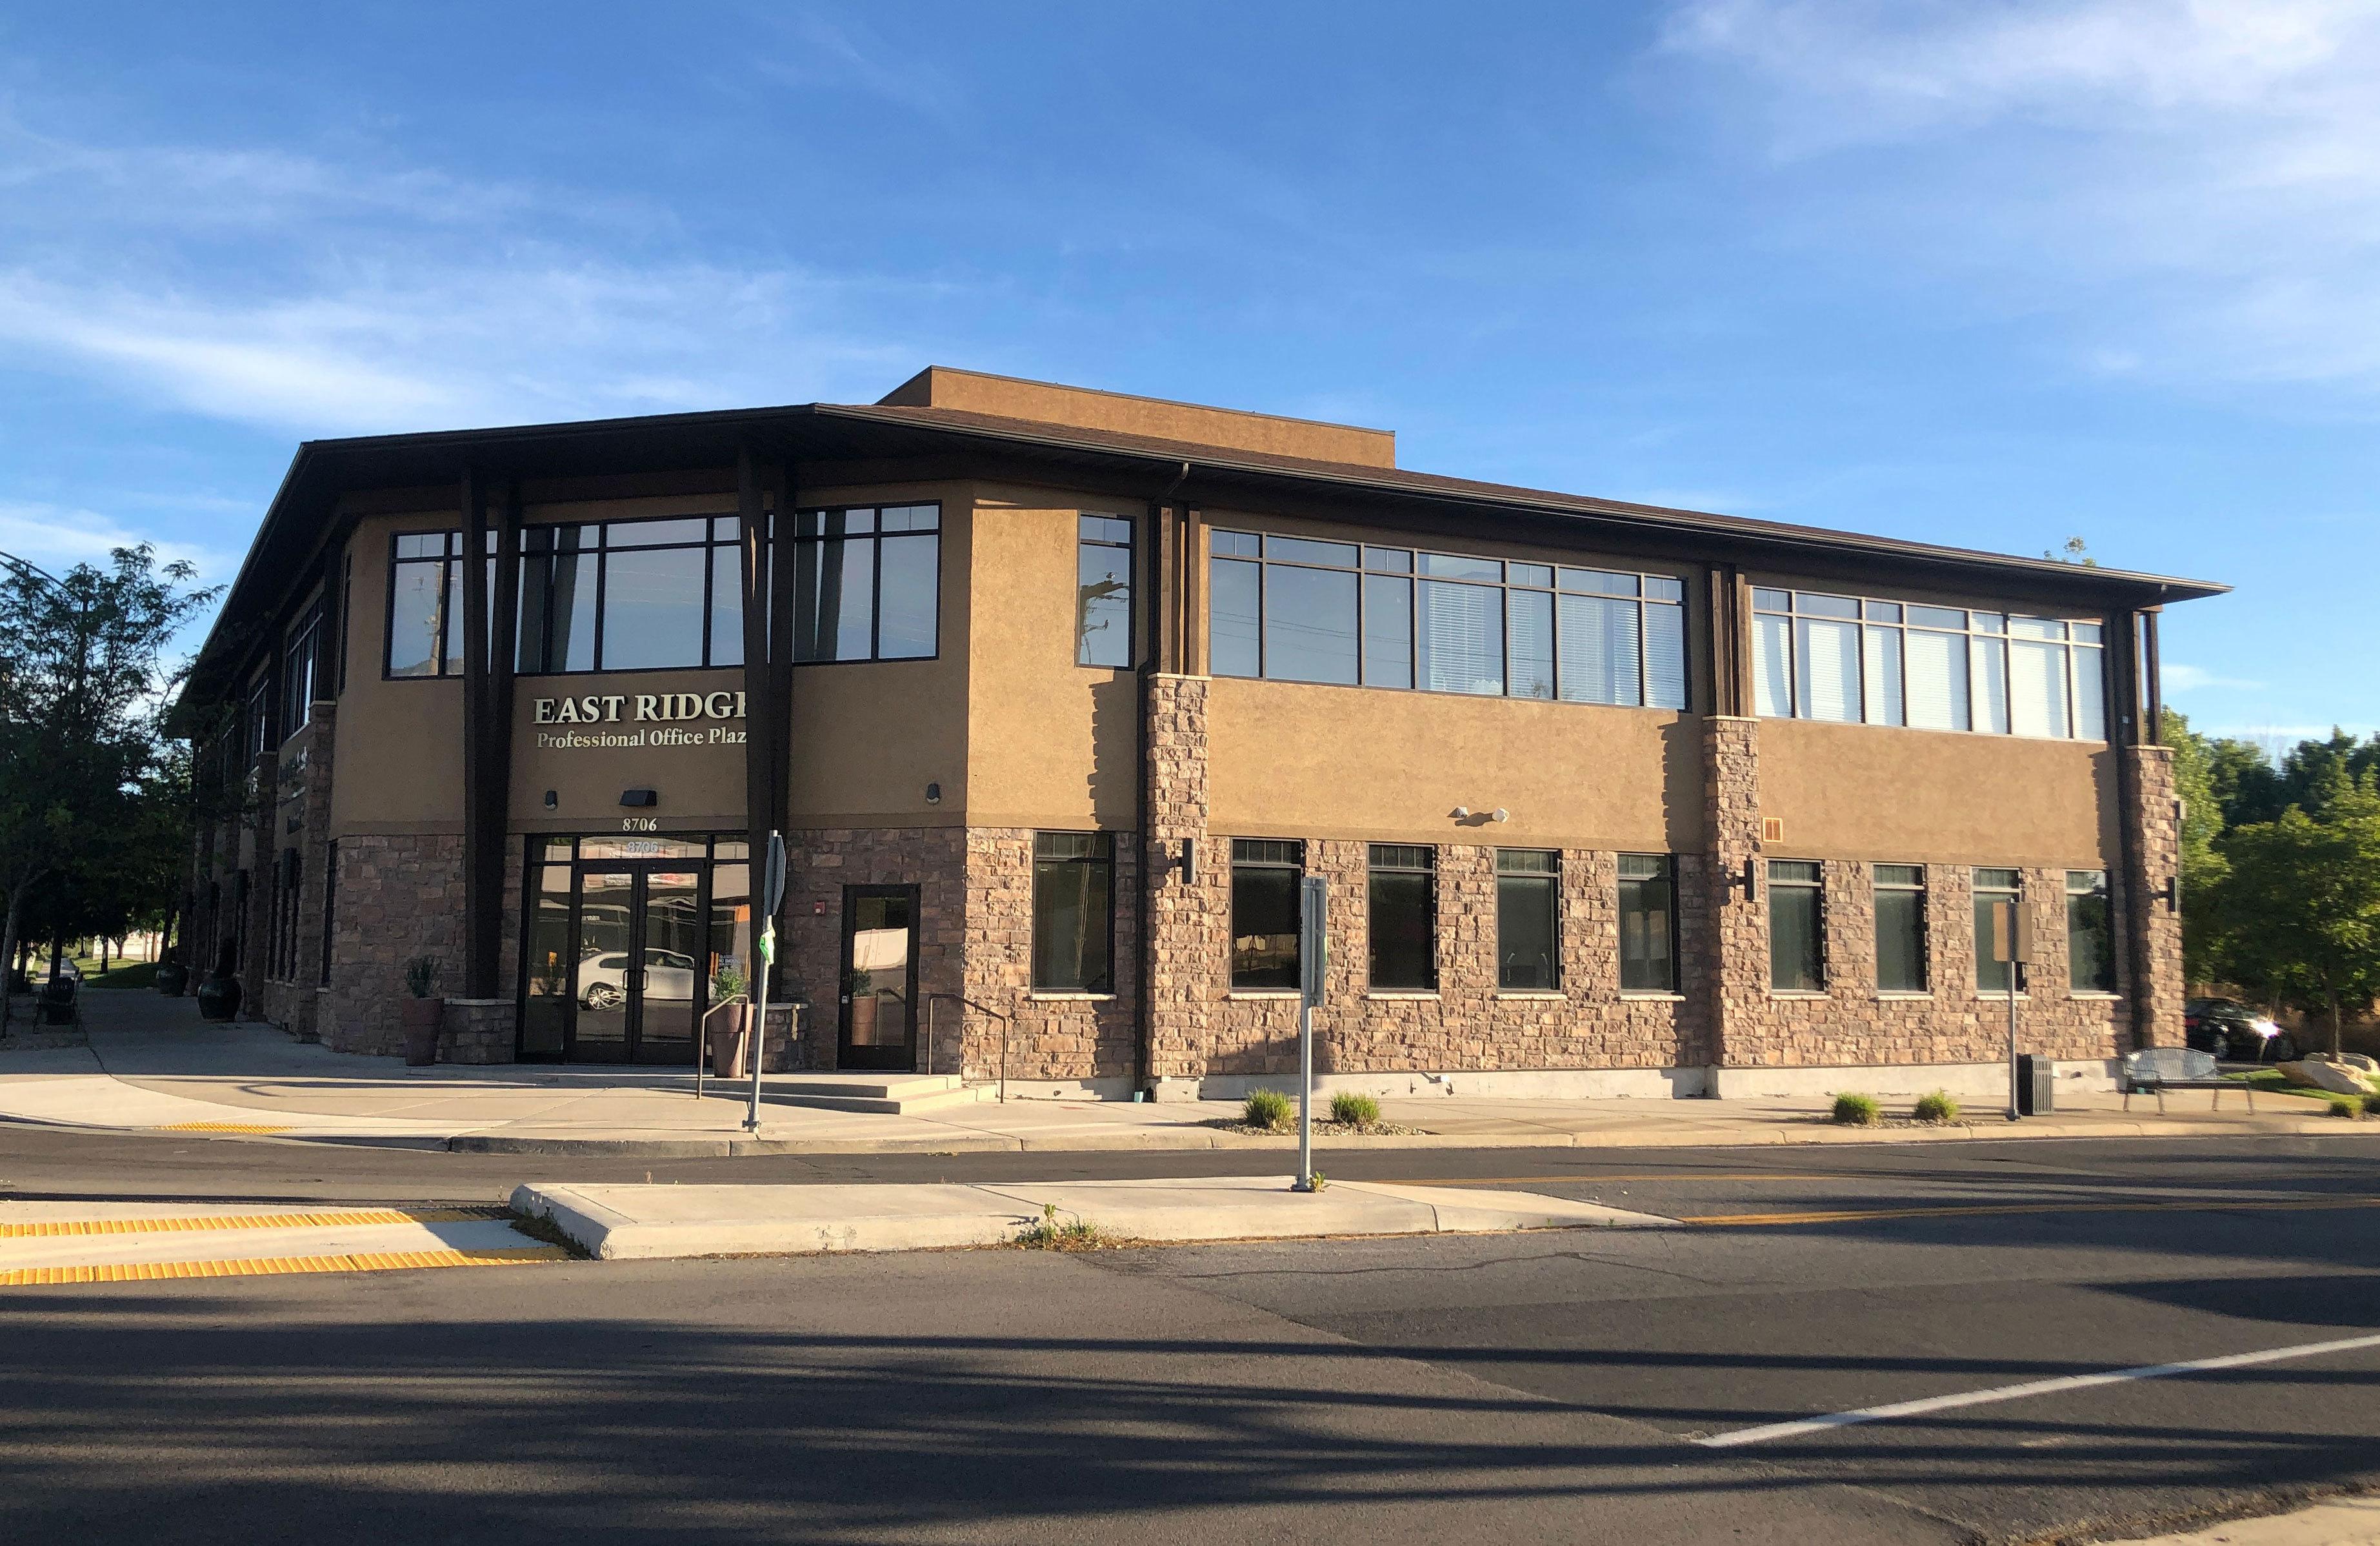 East Ridge Office Plaza